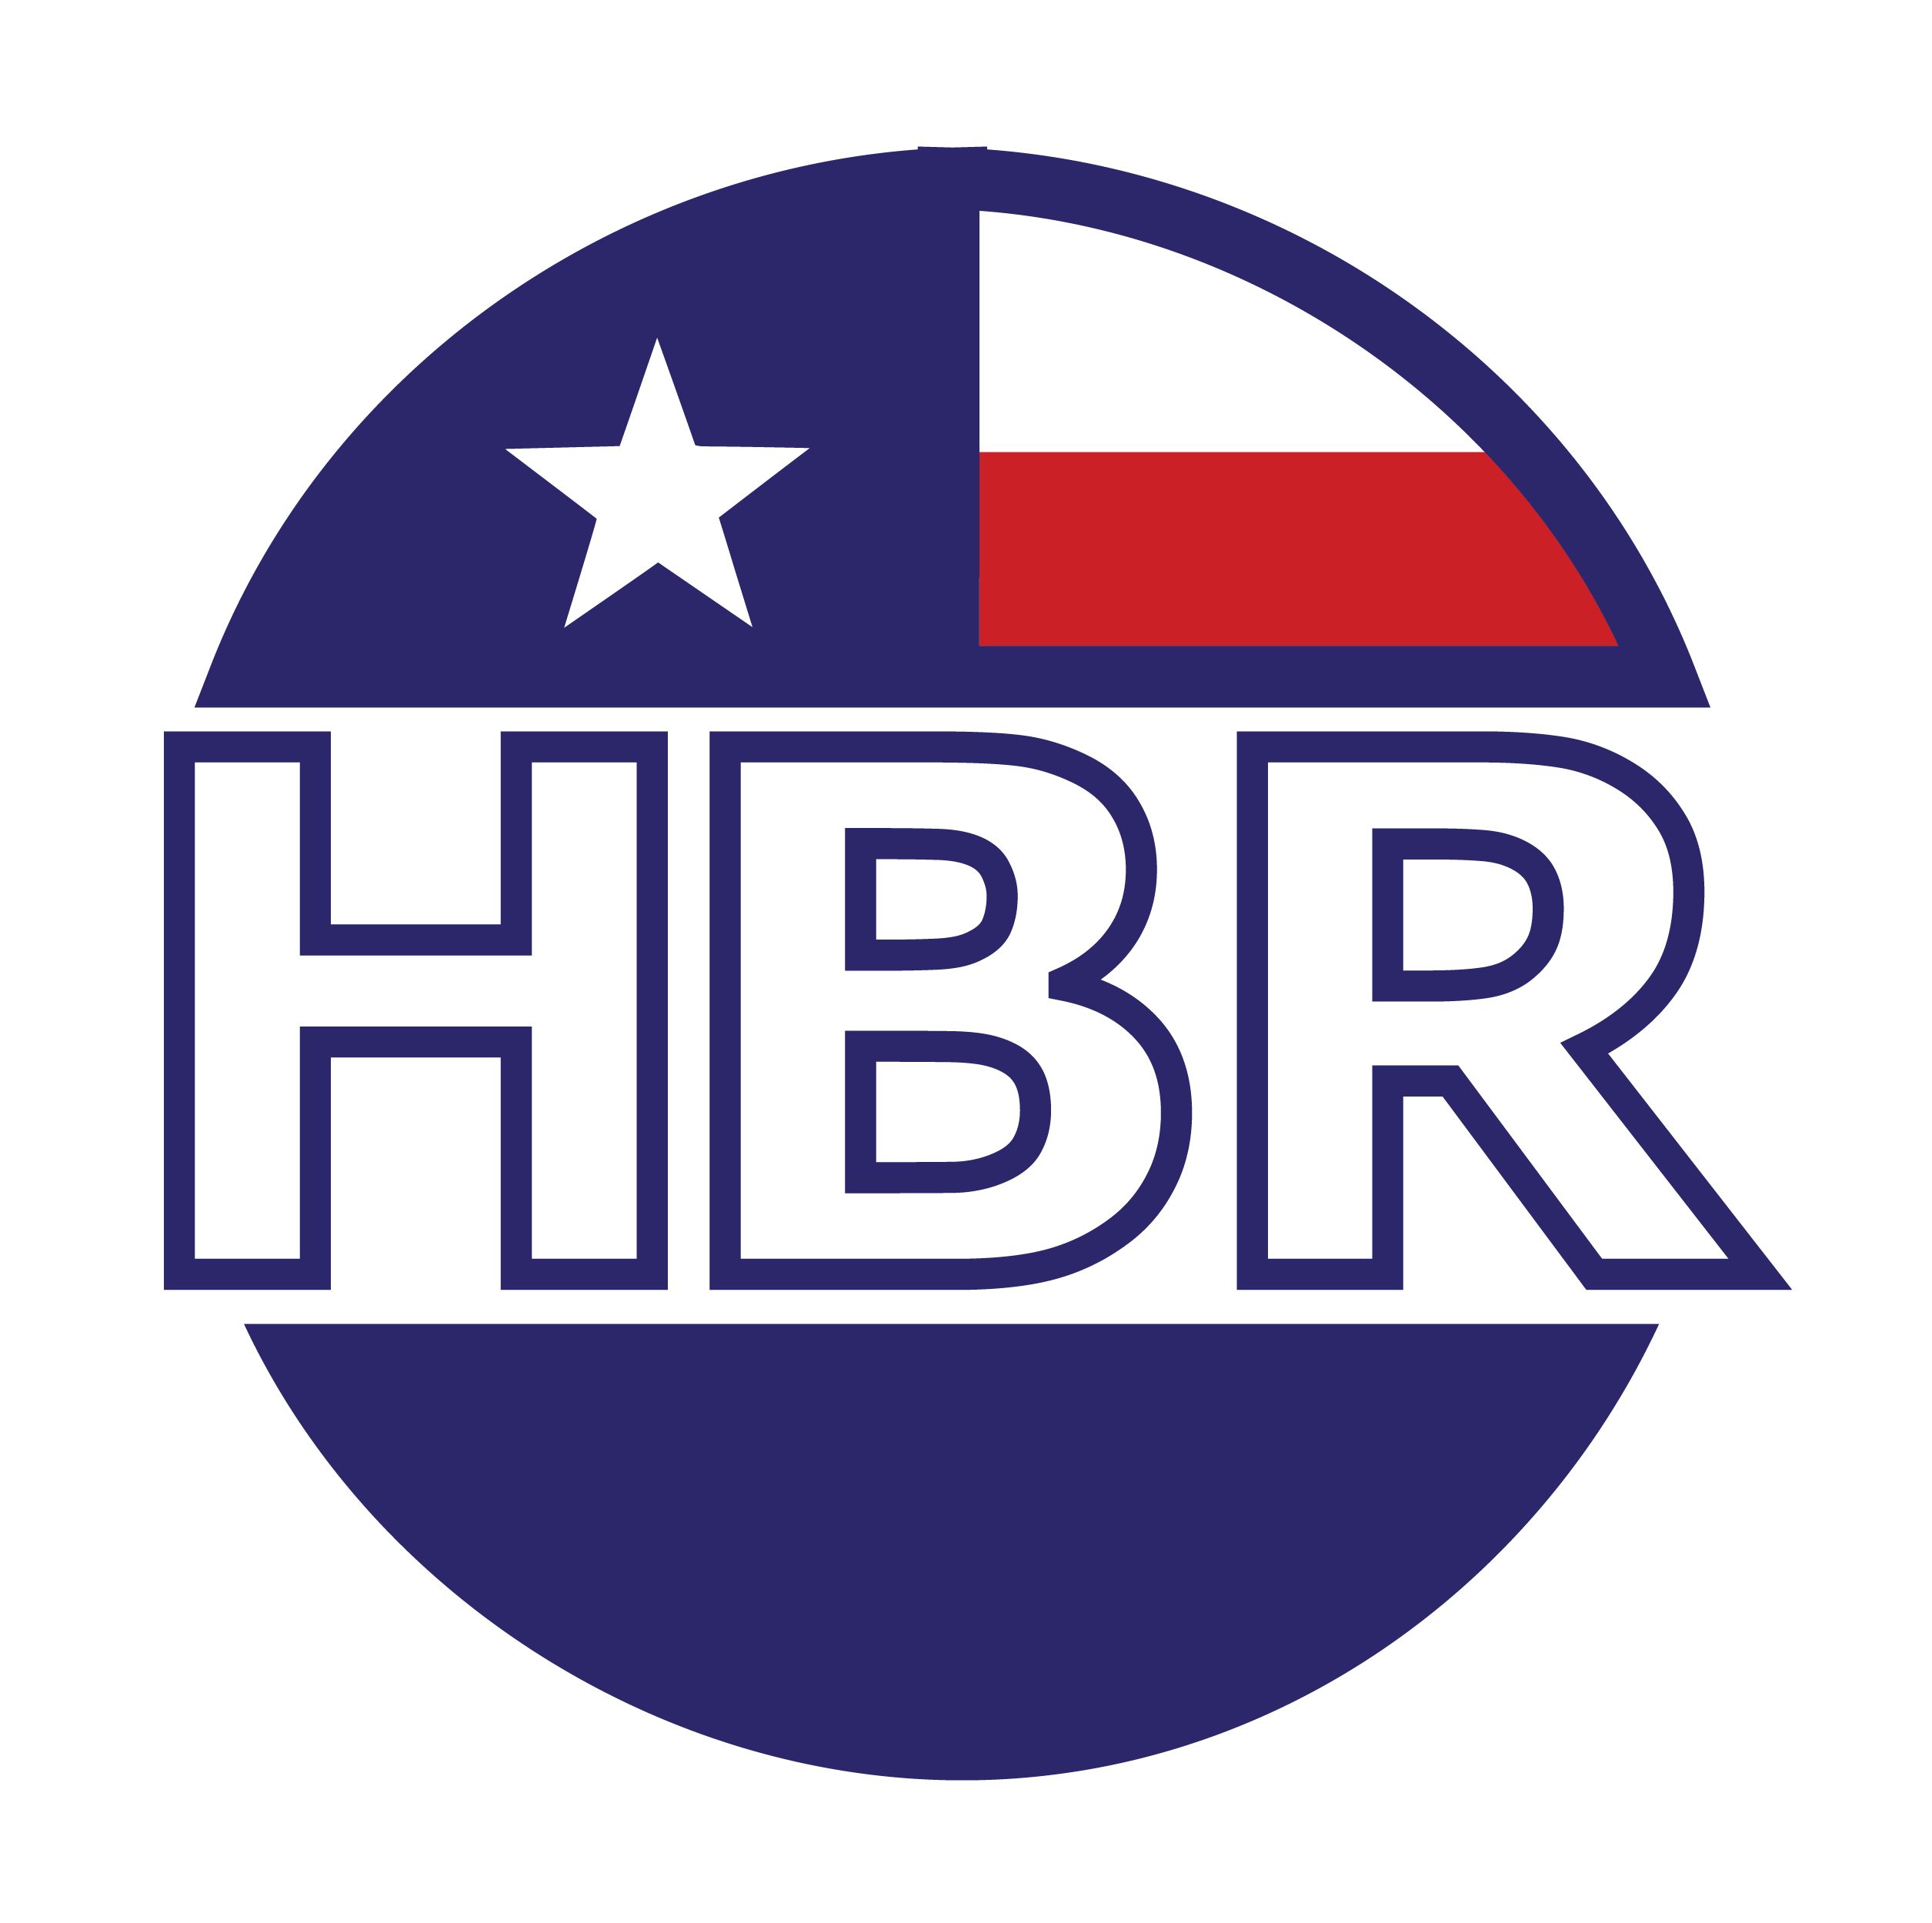 HBR_Logo-white-circle_form